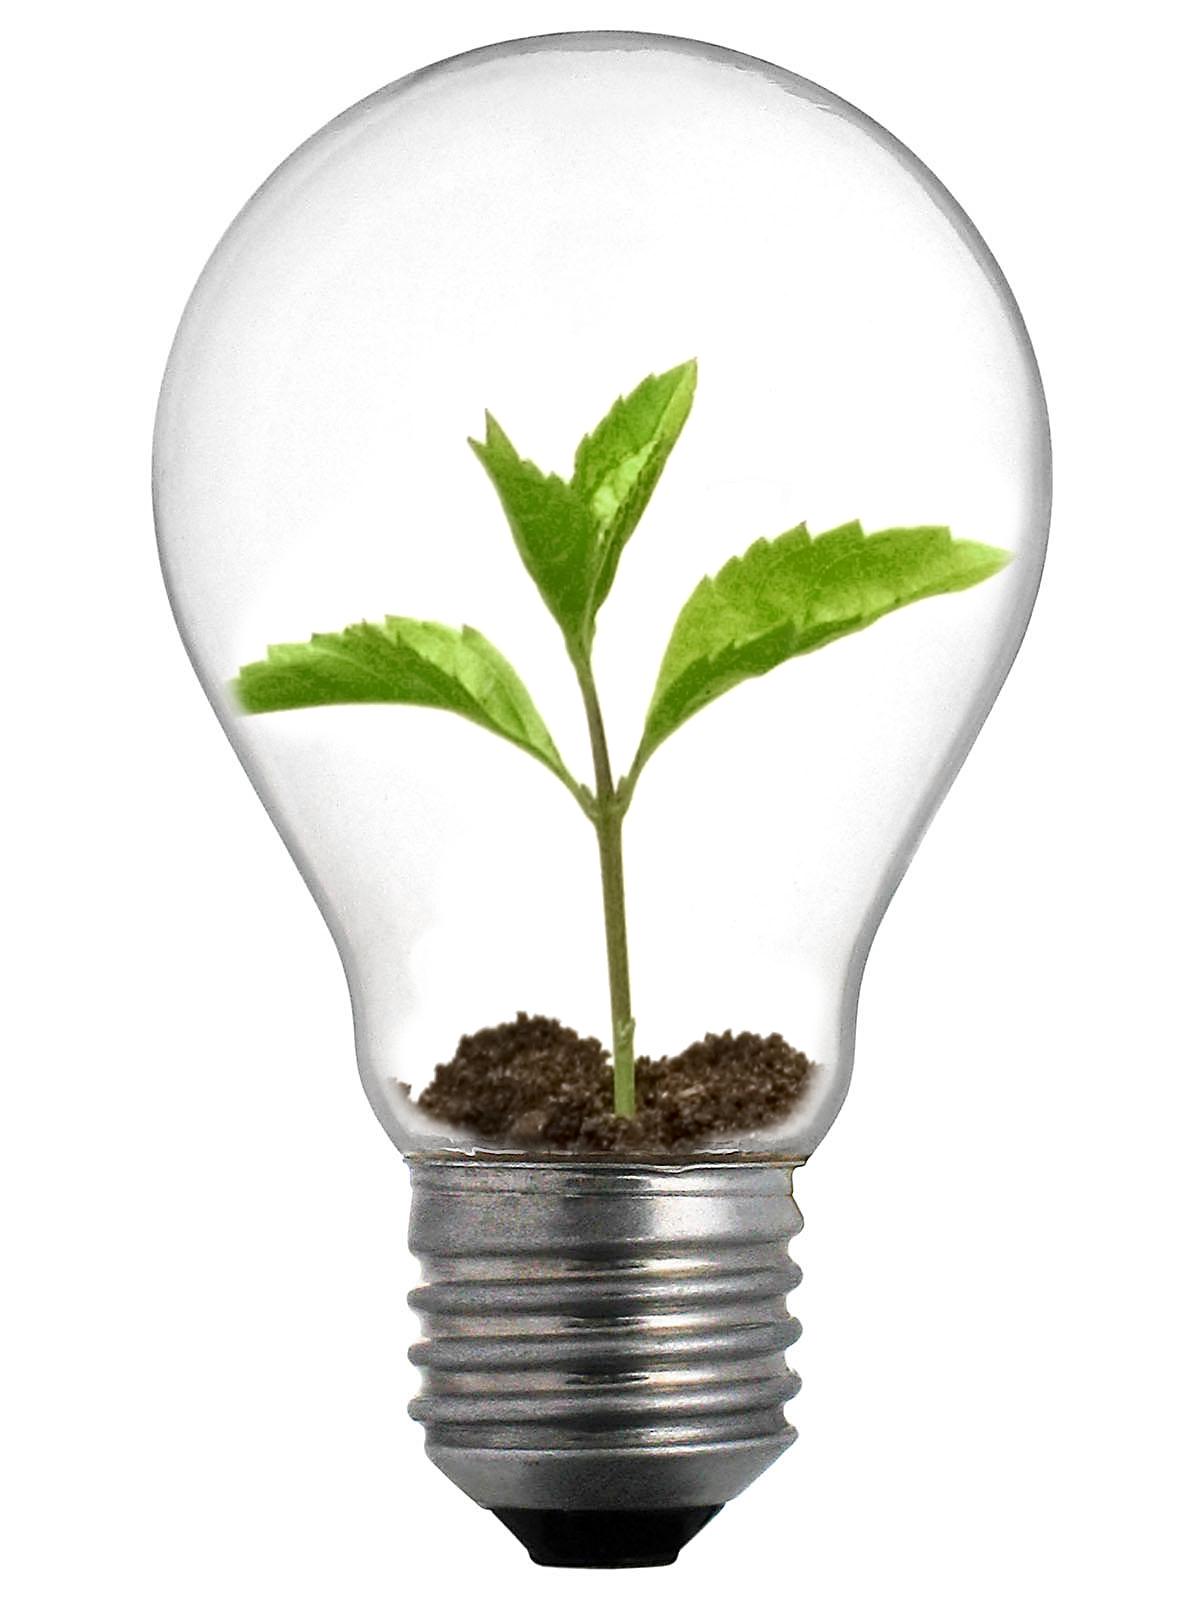 http://2.bp.blogspot.com/-RiPBhUhoT0I/Ta37vCPh-CI/AAAAAAAAAEQ/EpGdy8BIvqA/s1600/Sprout_Lightbulb.jpg